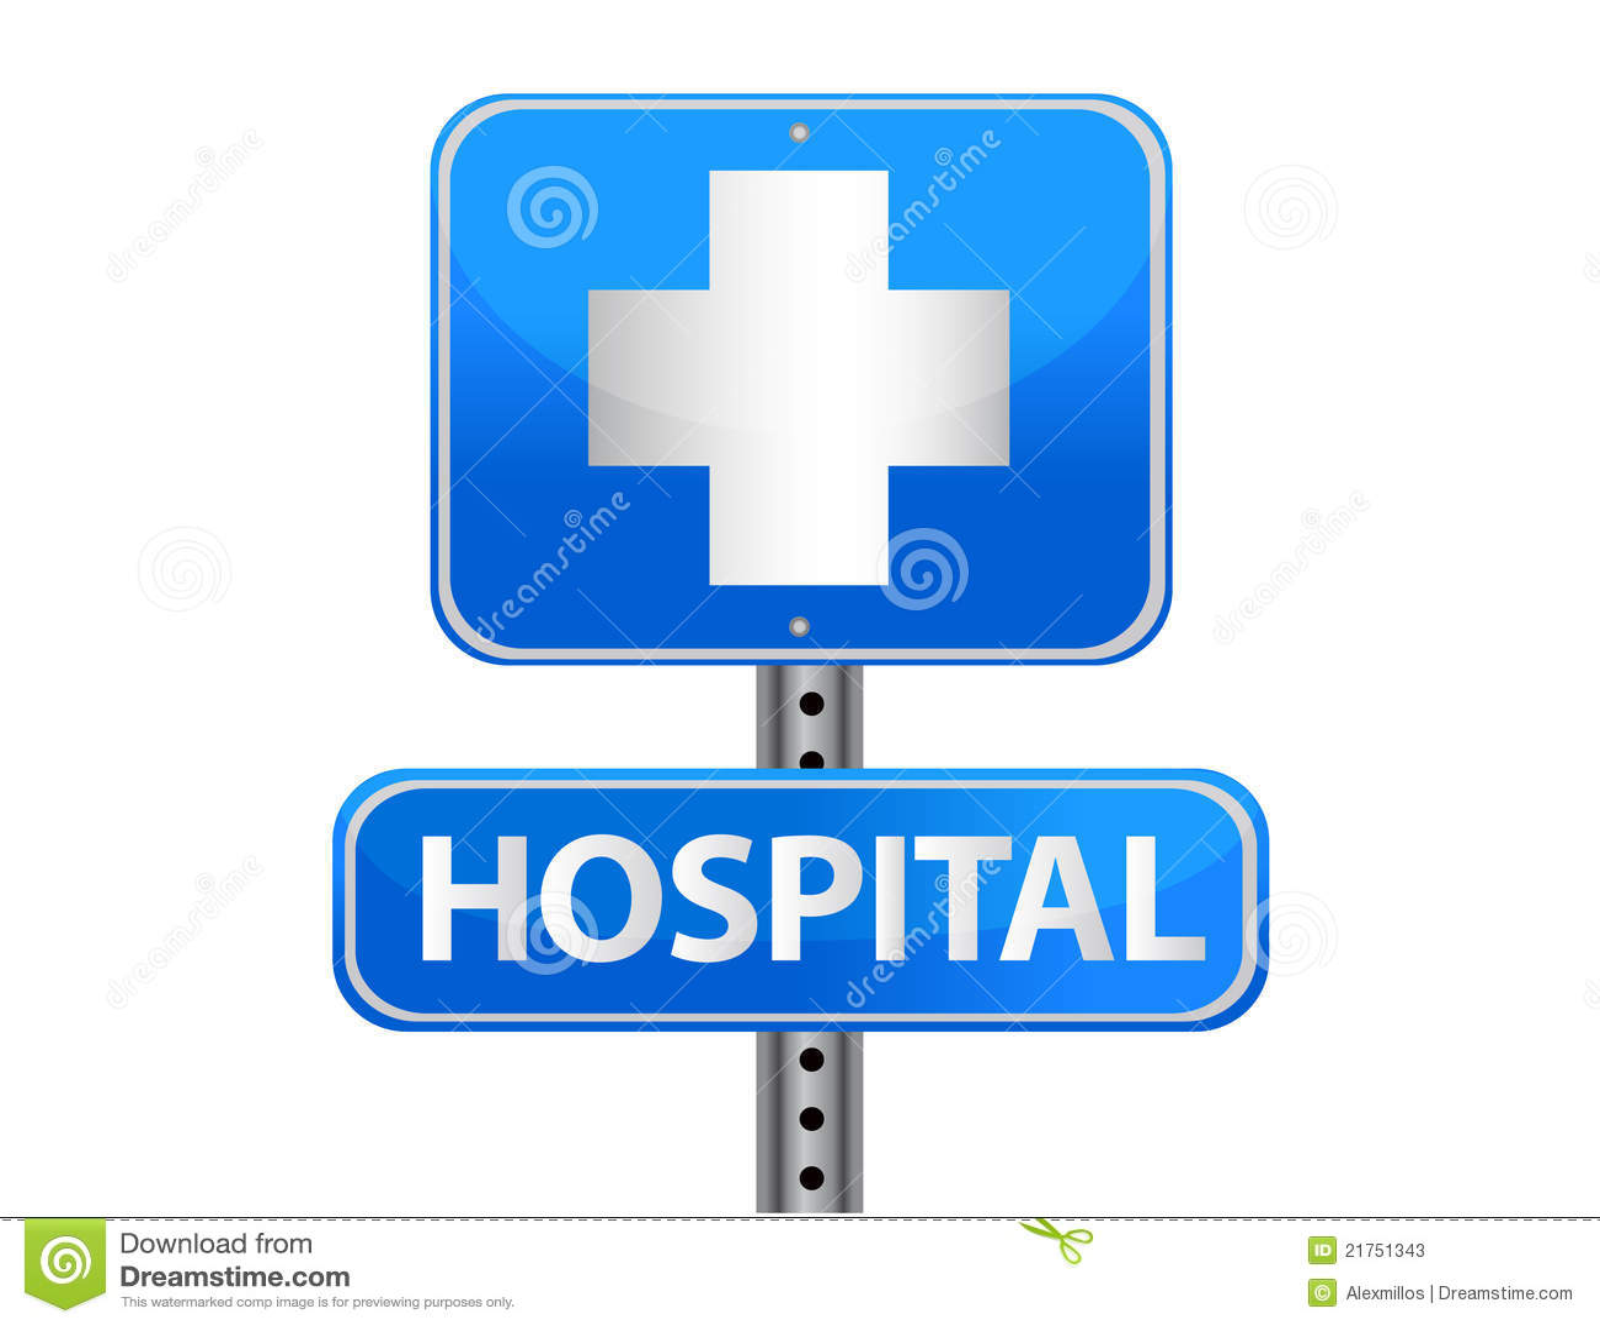 hospital street sign stock photos